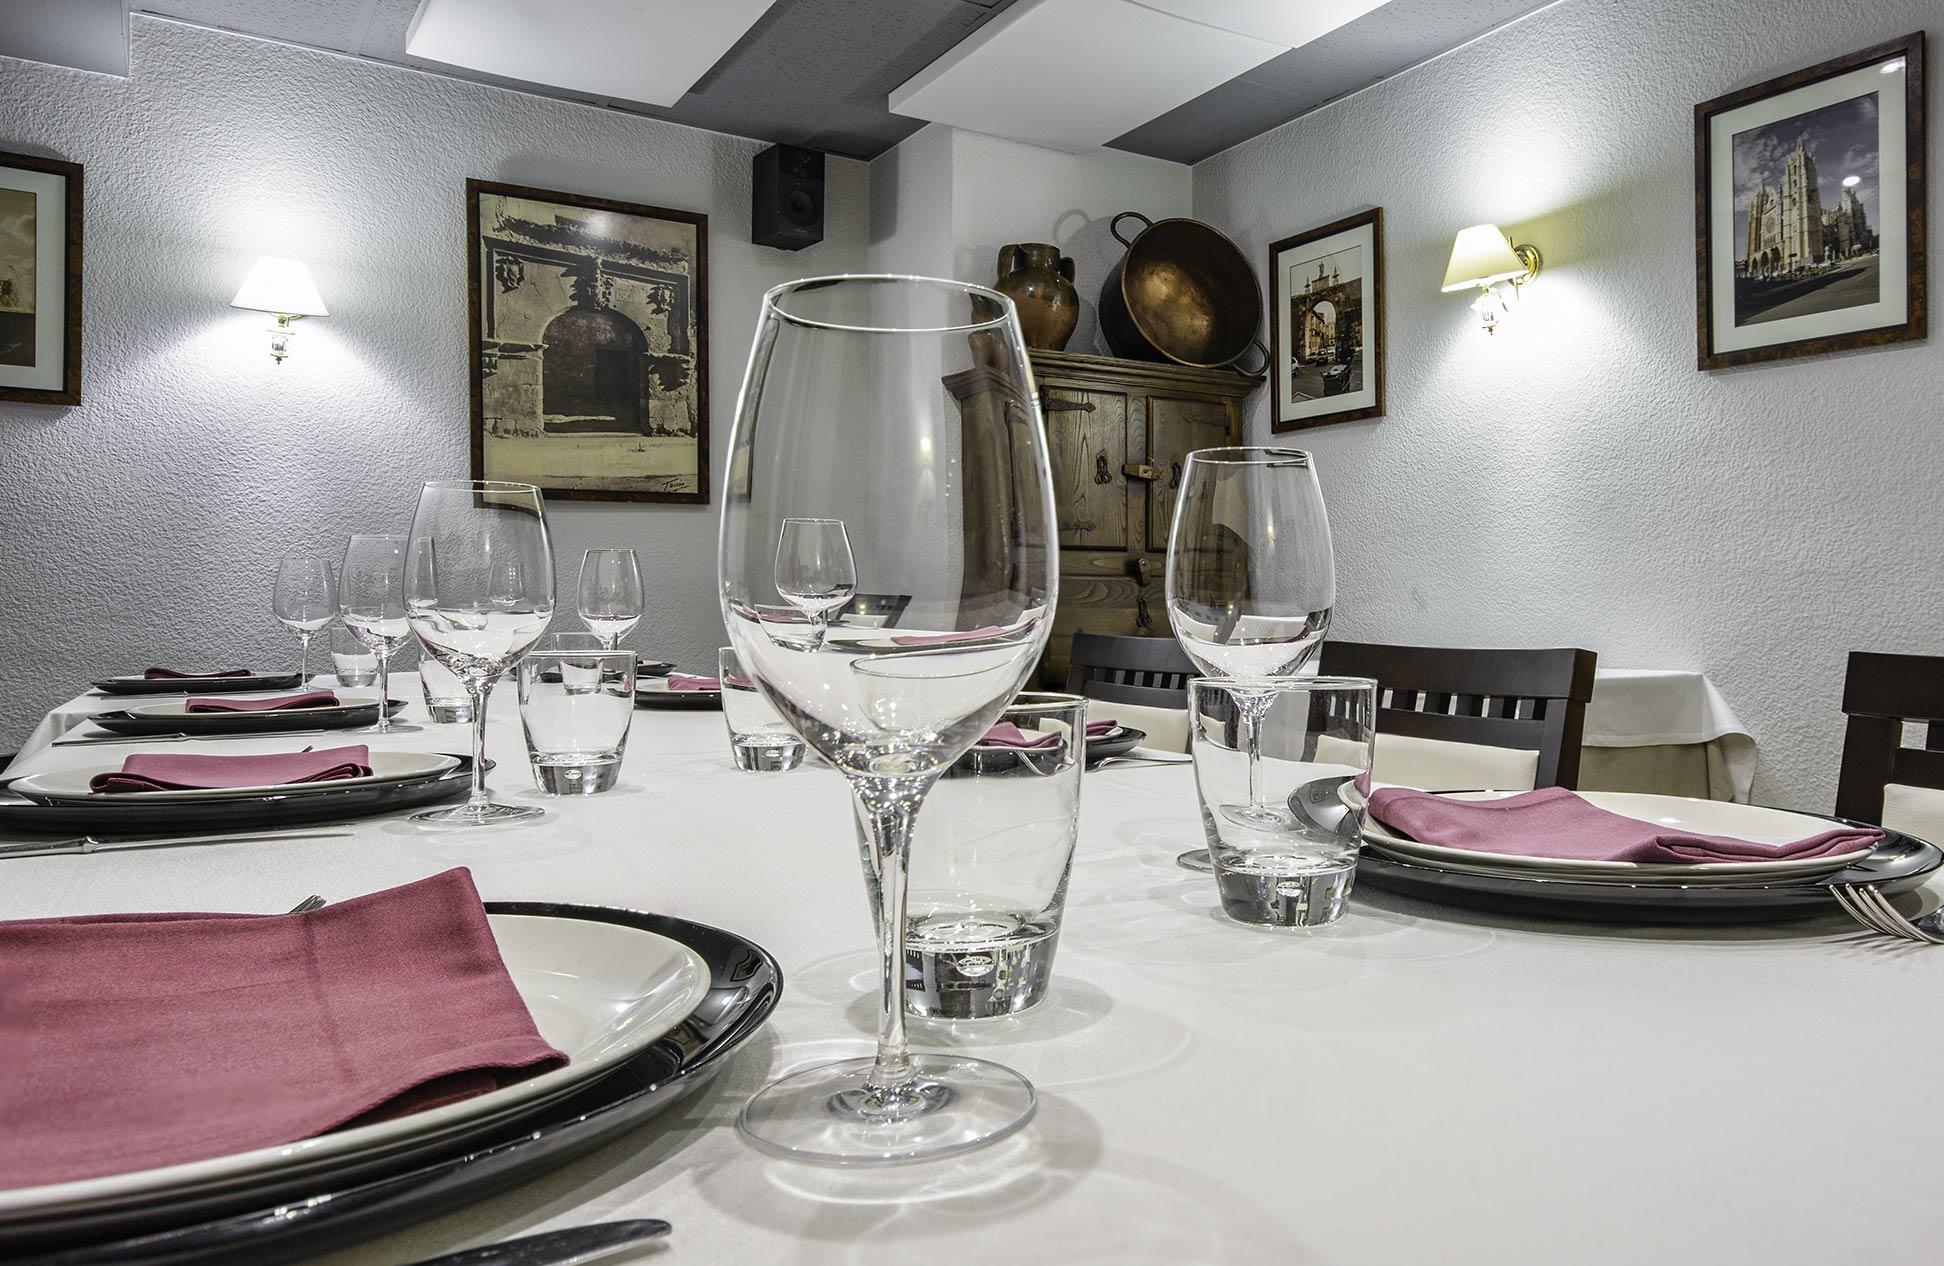 restaurante_valderas17